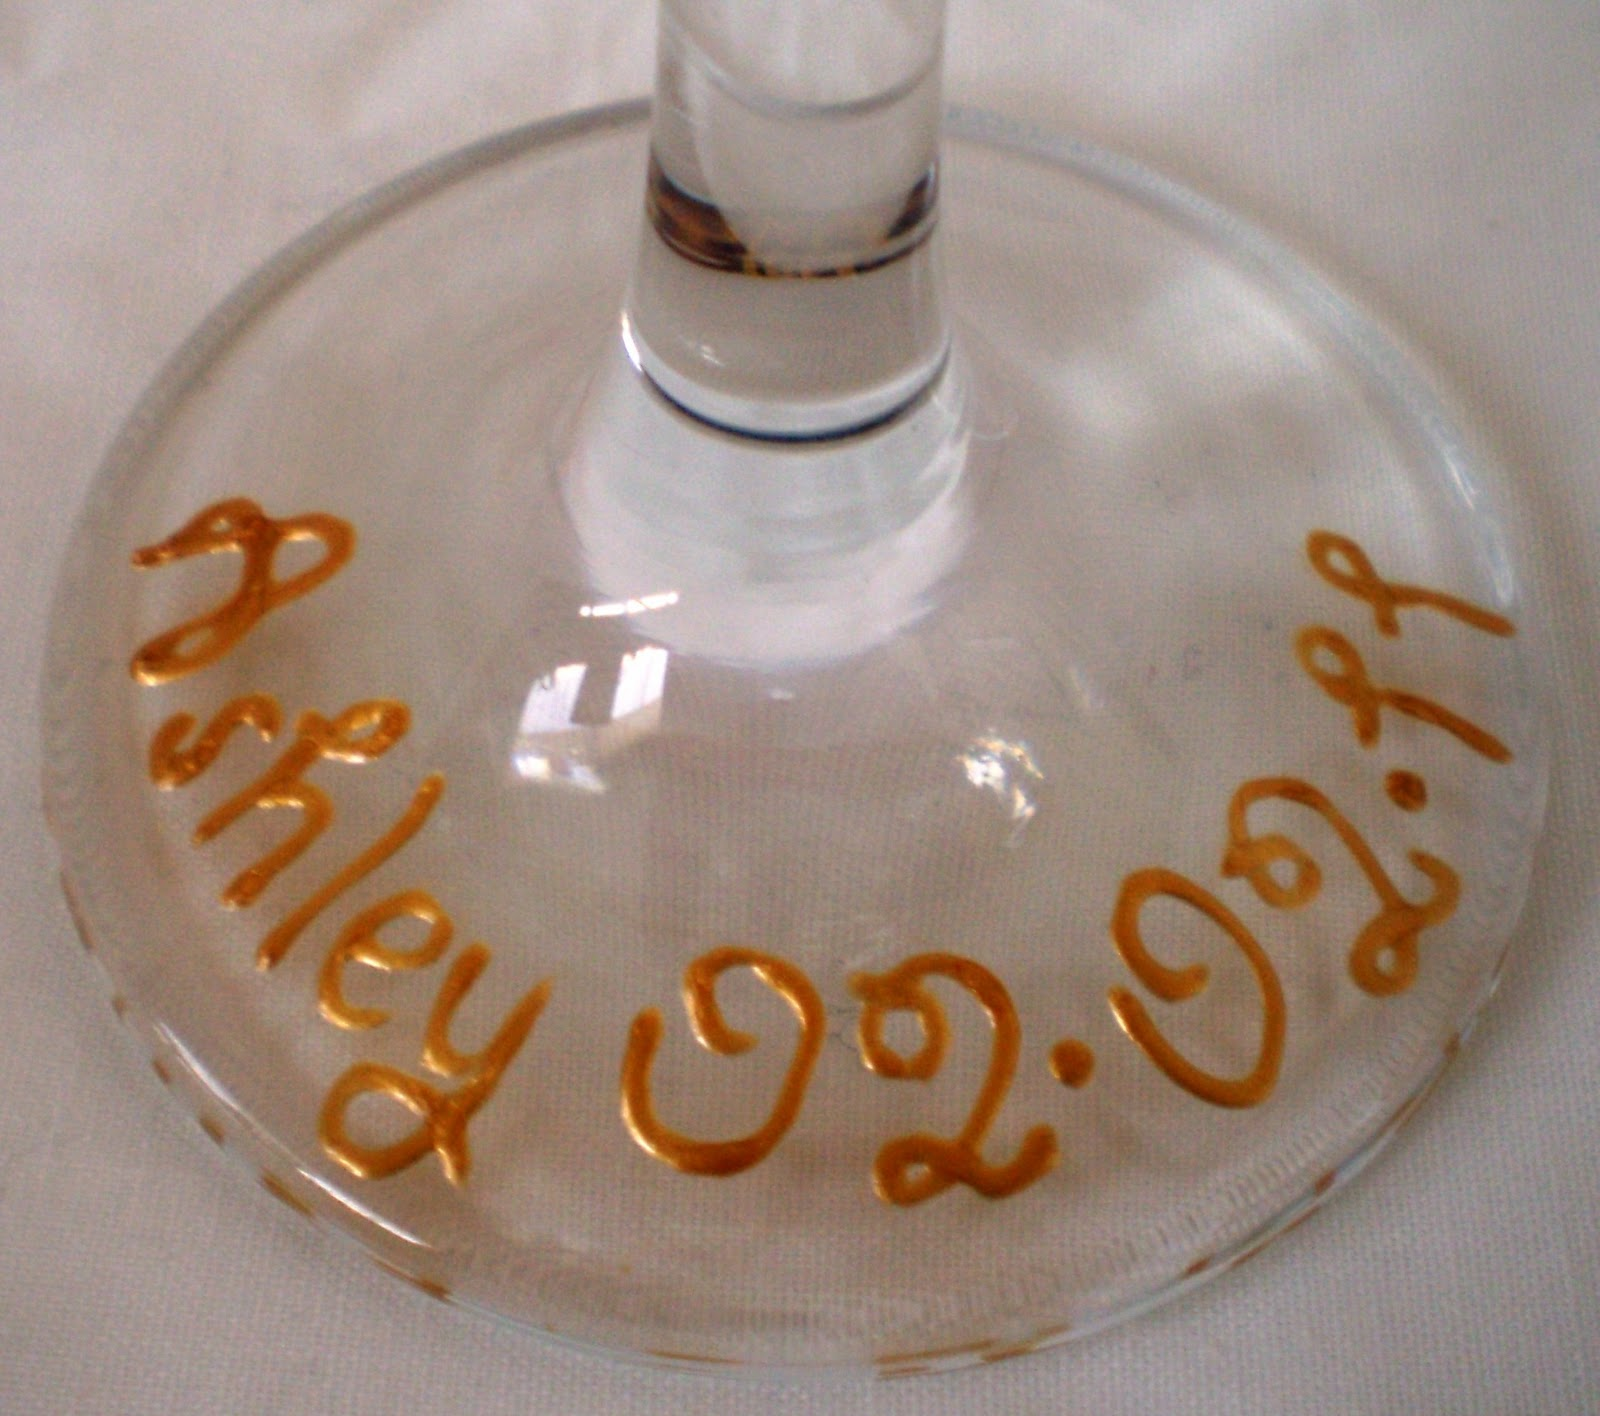 http://1.bp.blogspot.com/_hcp9SMzChqU/TVJZmitcRYI/AAAAAAAAADk/M0MzApnX7vs/s1600/Personalised+Base+%2528Frangipani+Wine+Glass%2529.JPG